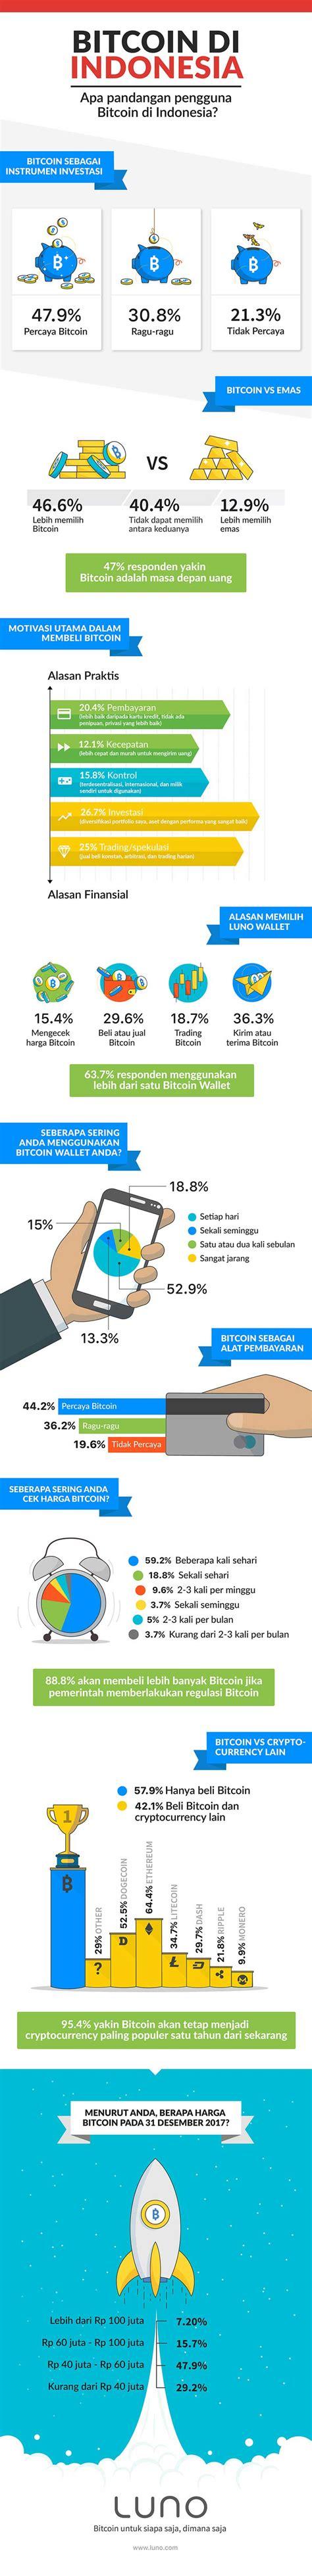 bitcoin di indonesia infografis penggunaan bitcoin di indonesia serta prediksi